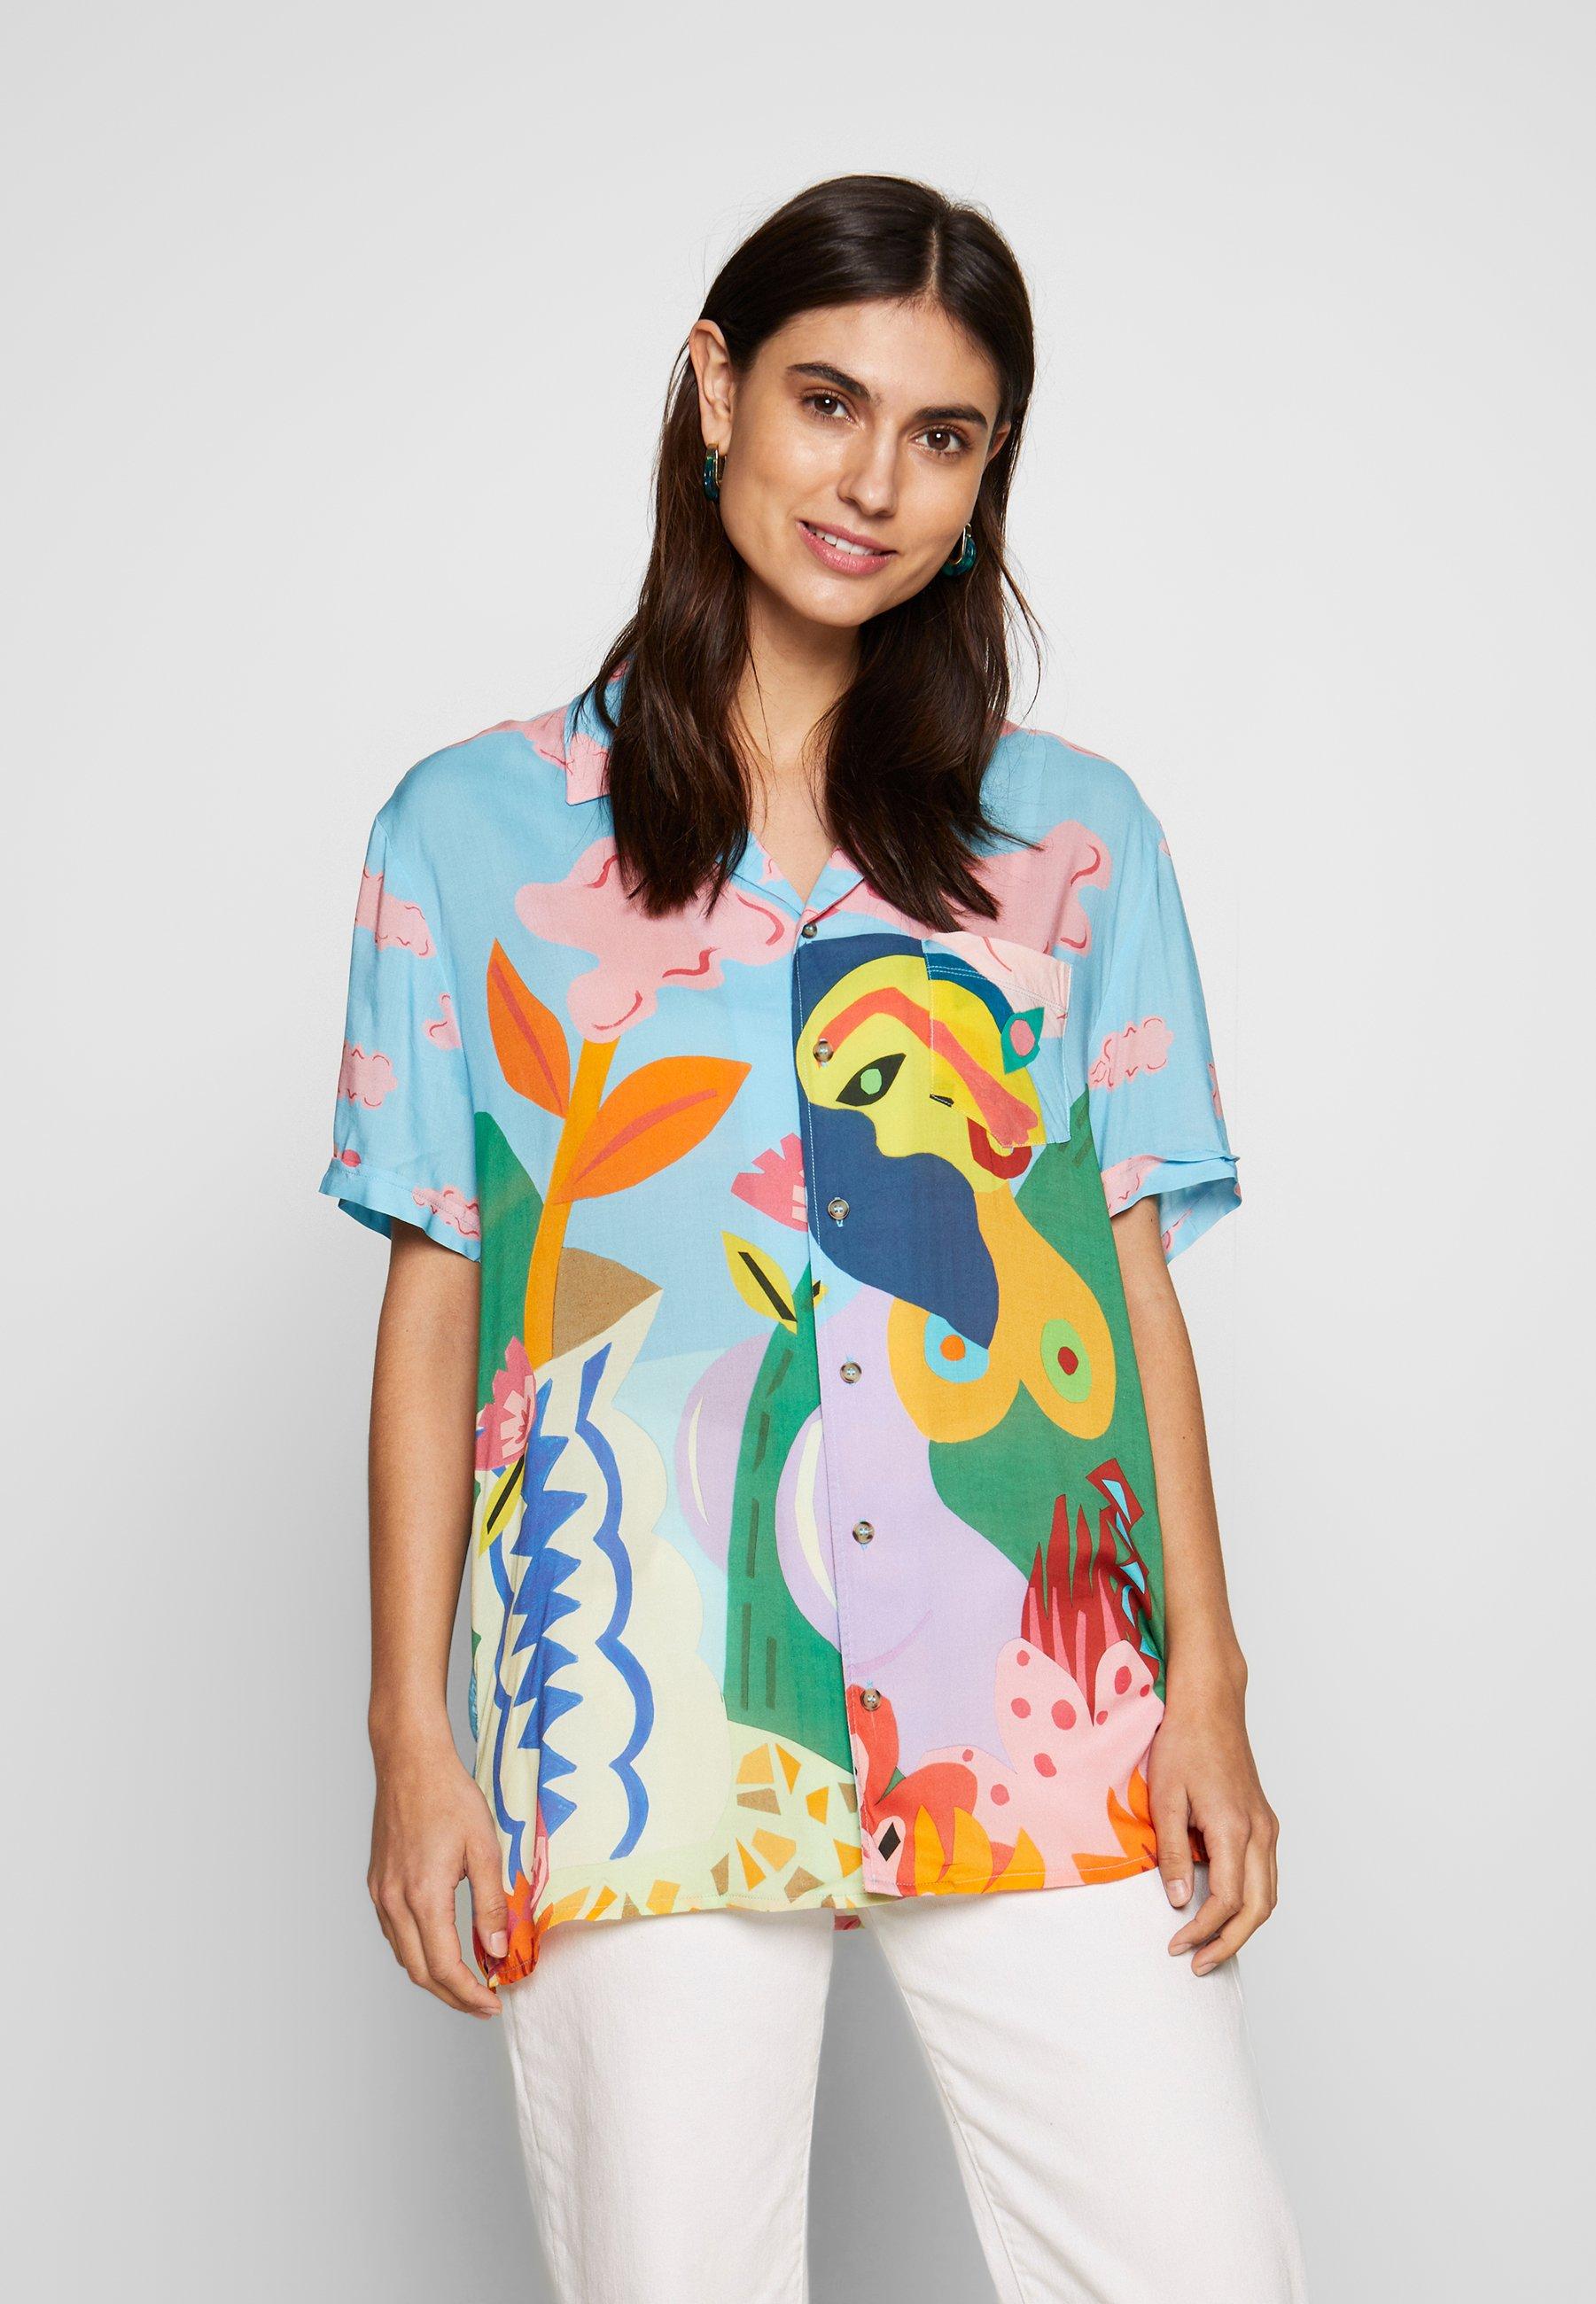 Desigual CAM MAKAR DESIGNED BY MIRANDA MAKAROFF Camisa